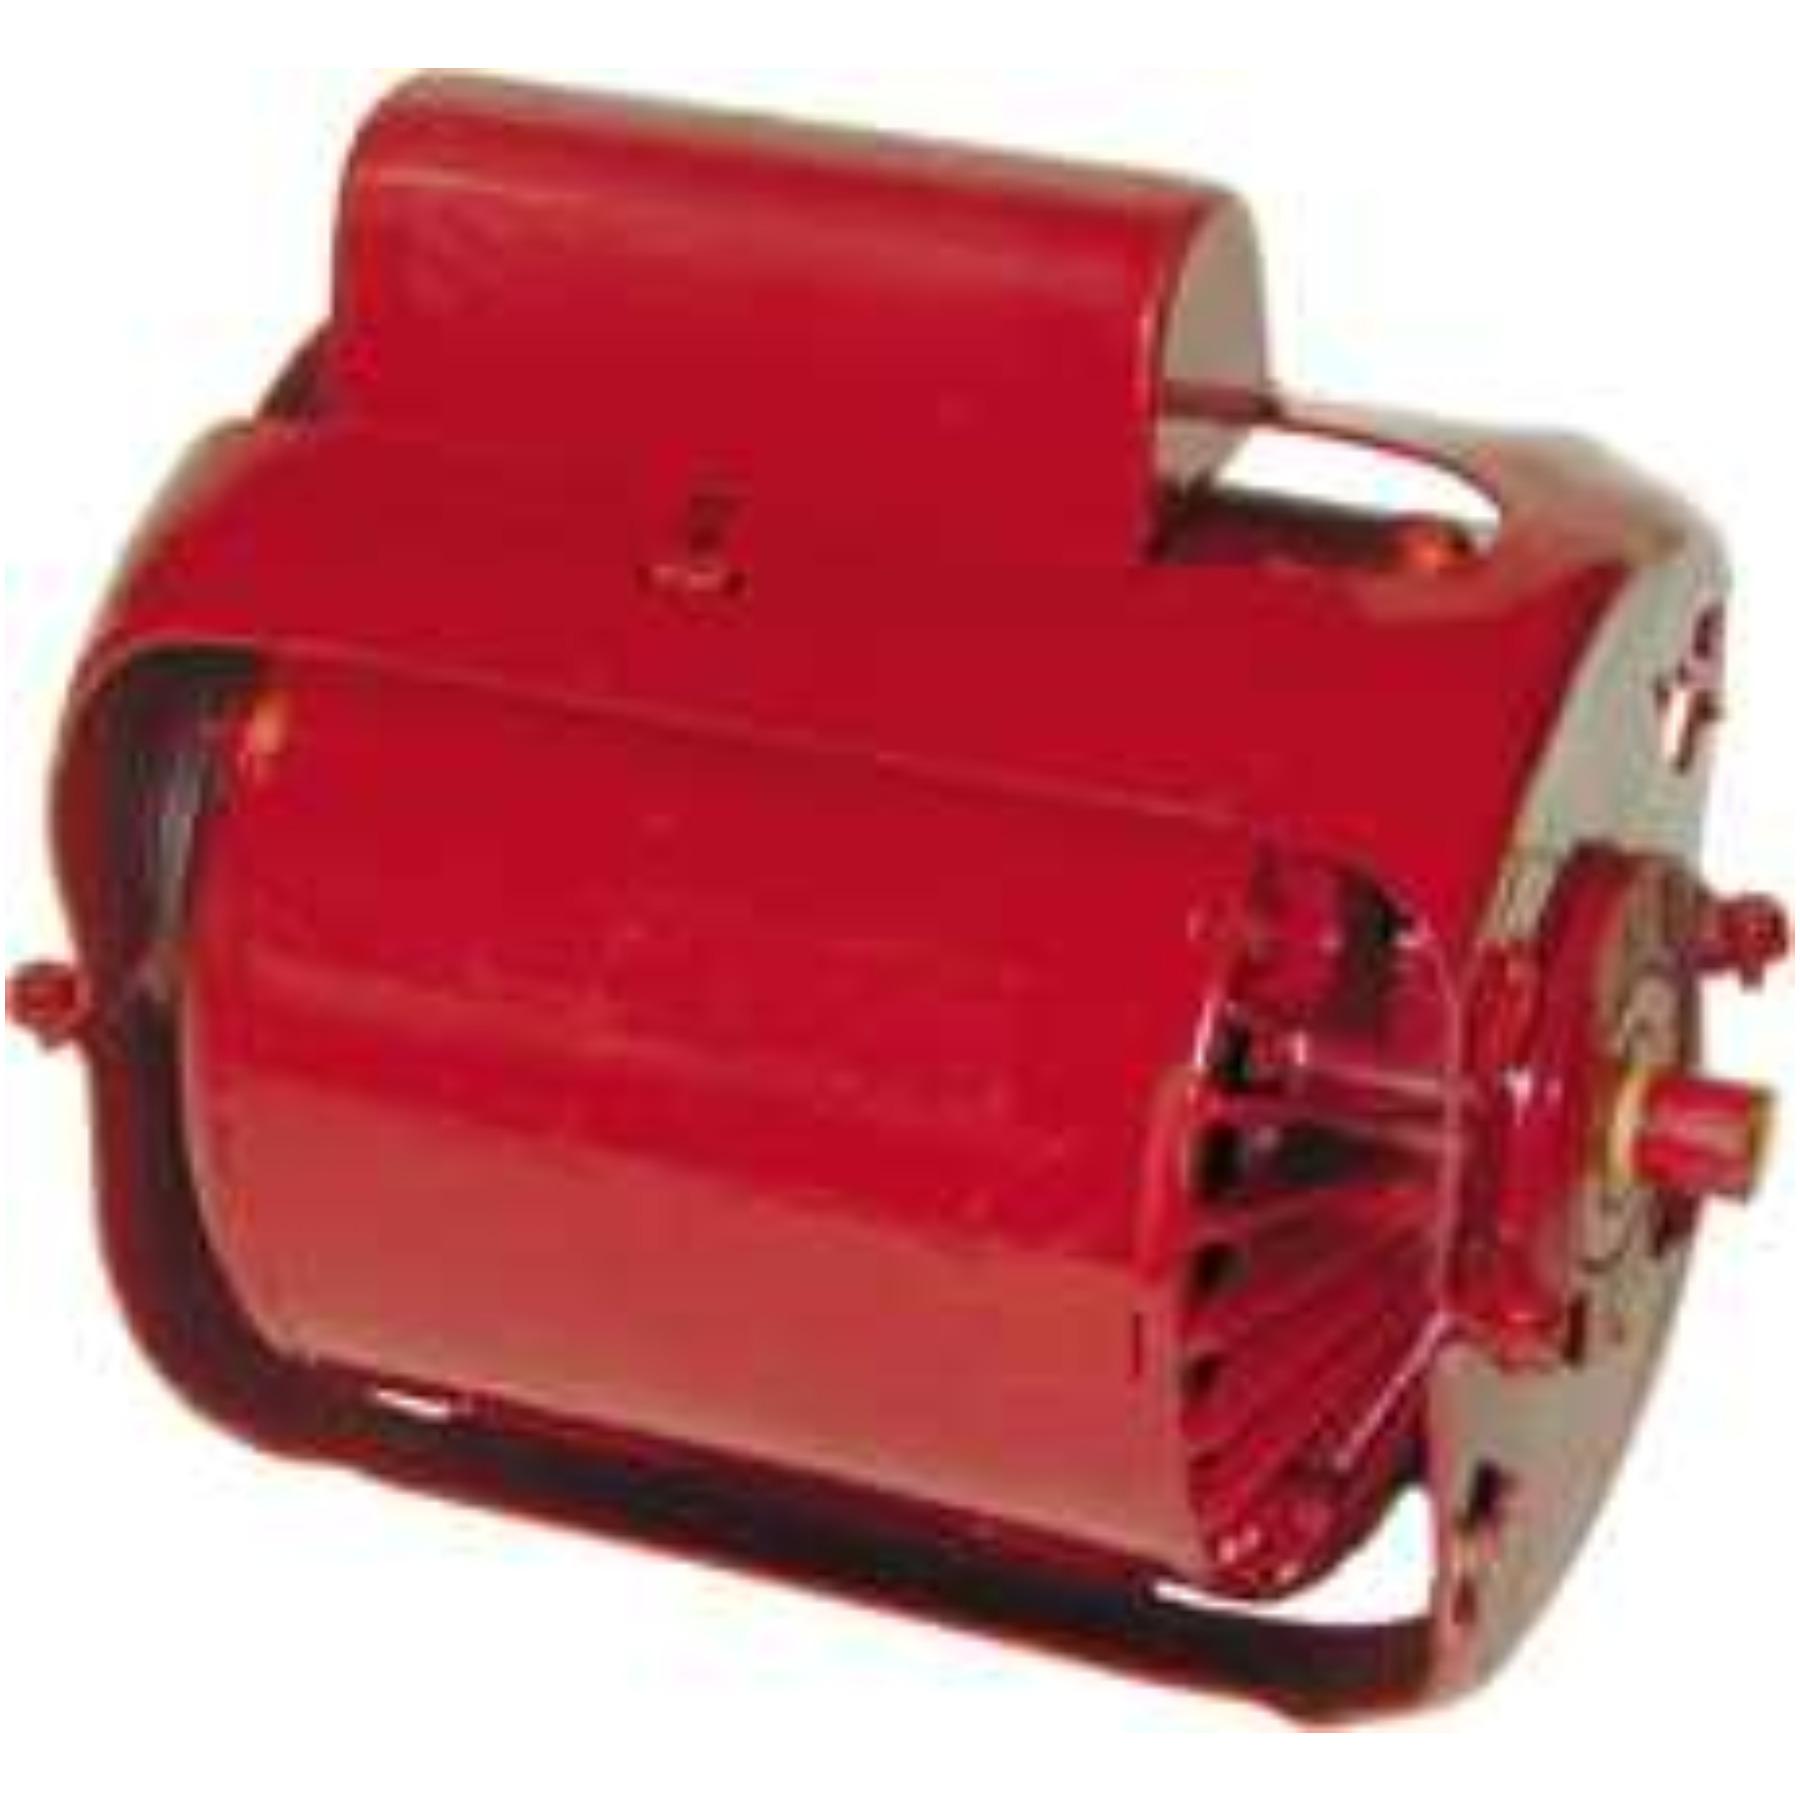 BELL & GOSSETT 111031 POWER PACK 115 VOLT 1/6 HP FOR BOOSTER PUMPS 6 IN. BRACKET 5 IN. BOLT PATTERN